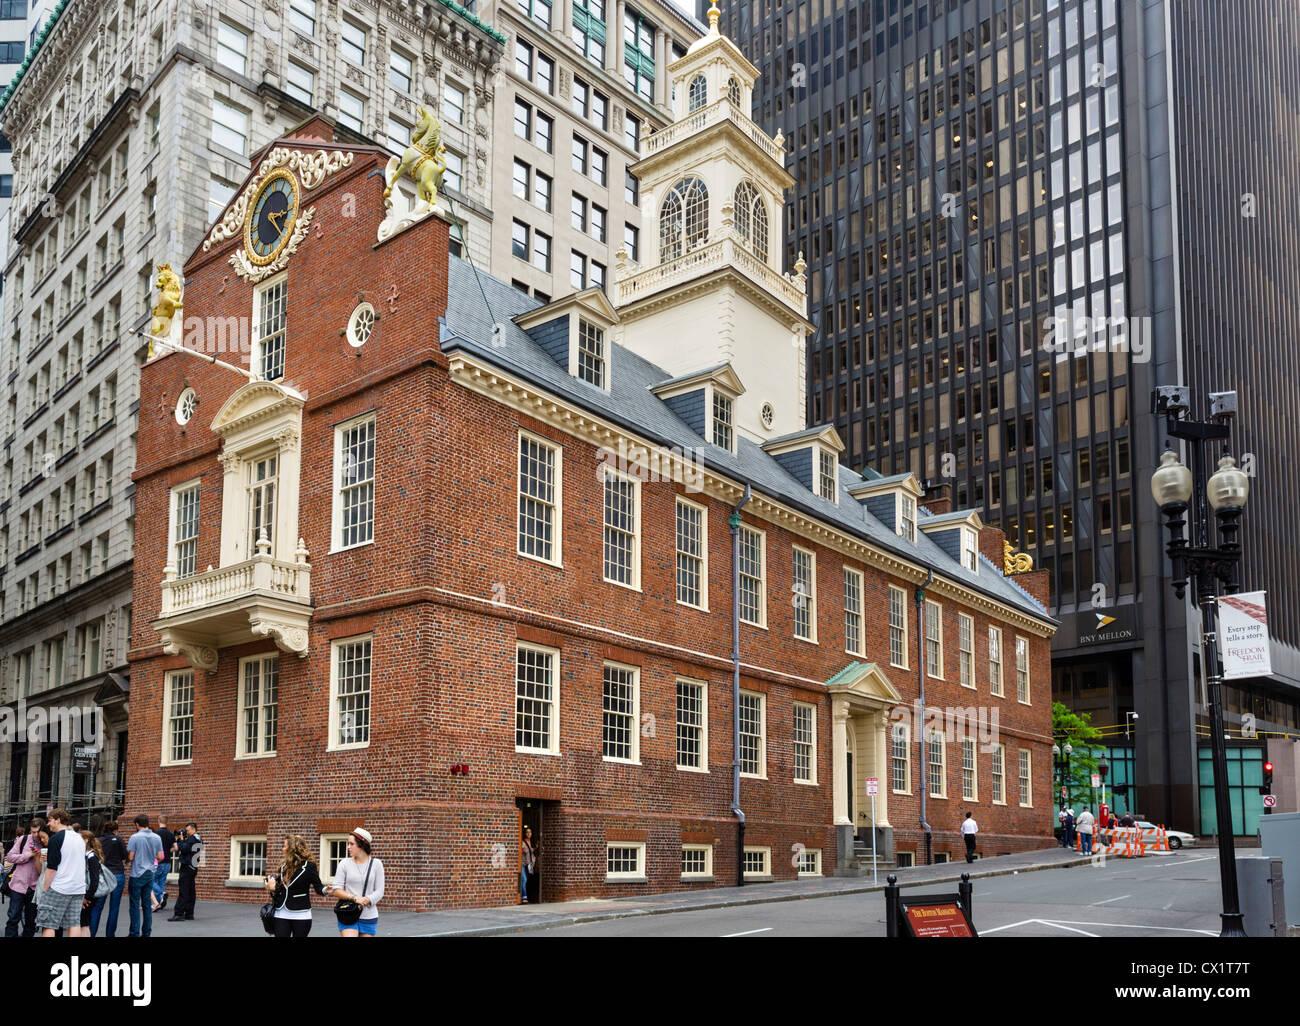 El histórico Old State House Museum, Boston, Massachusetts, EE.UU. Imagen De Stock